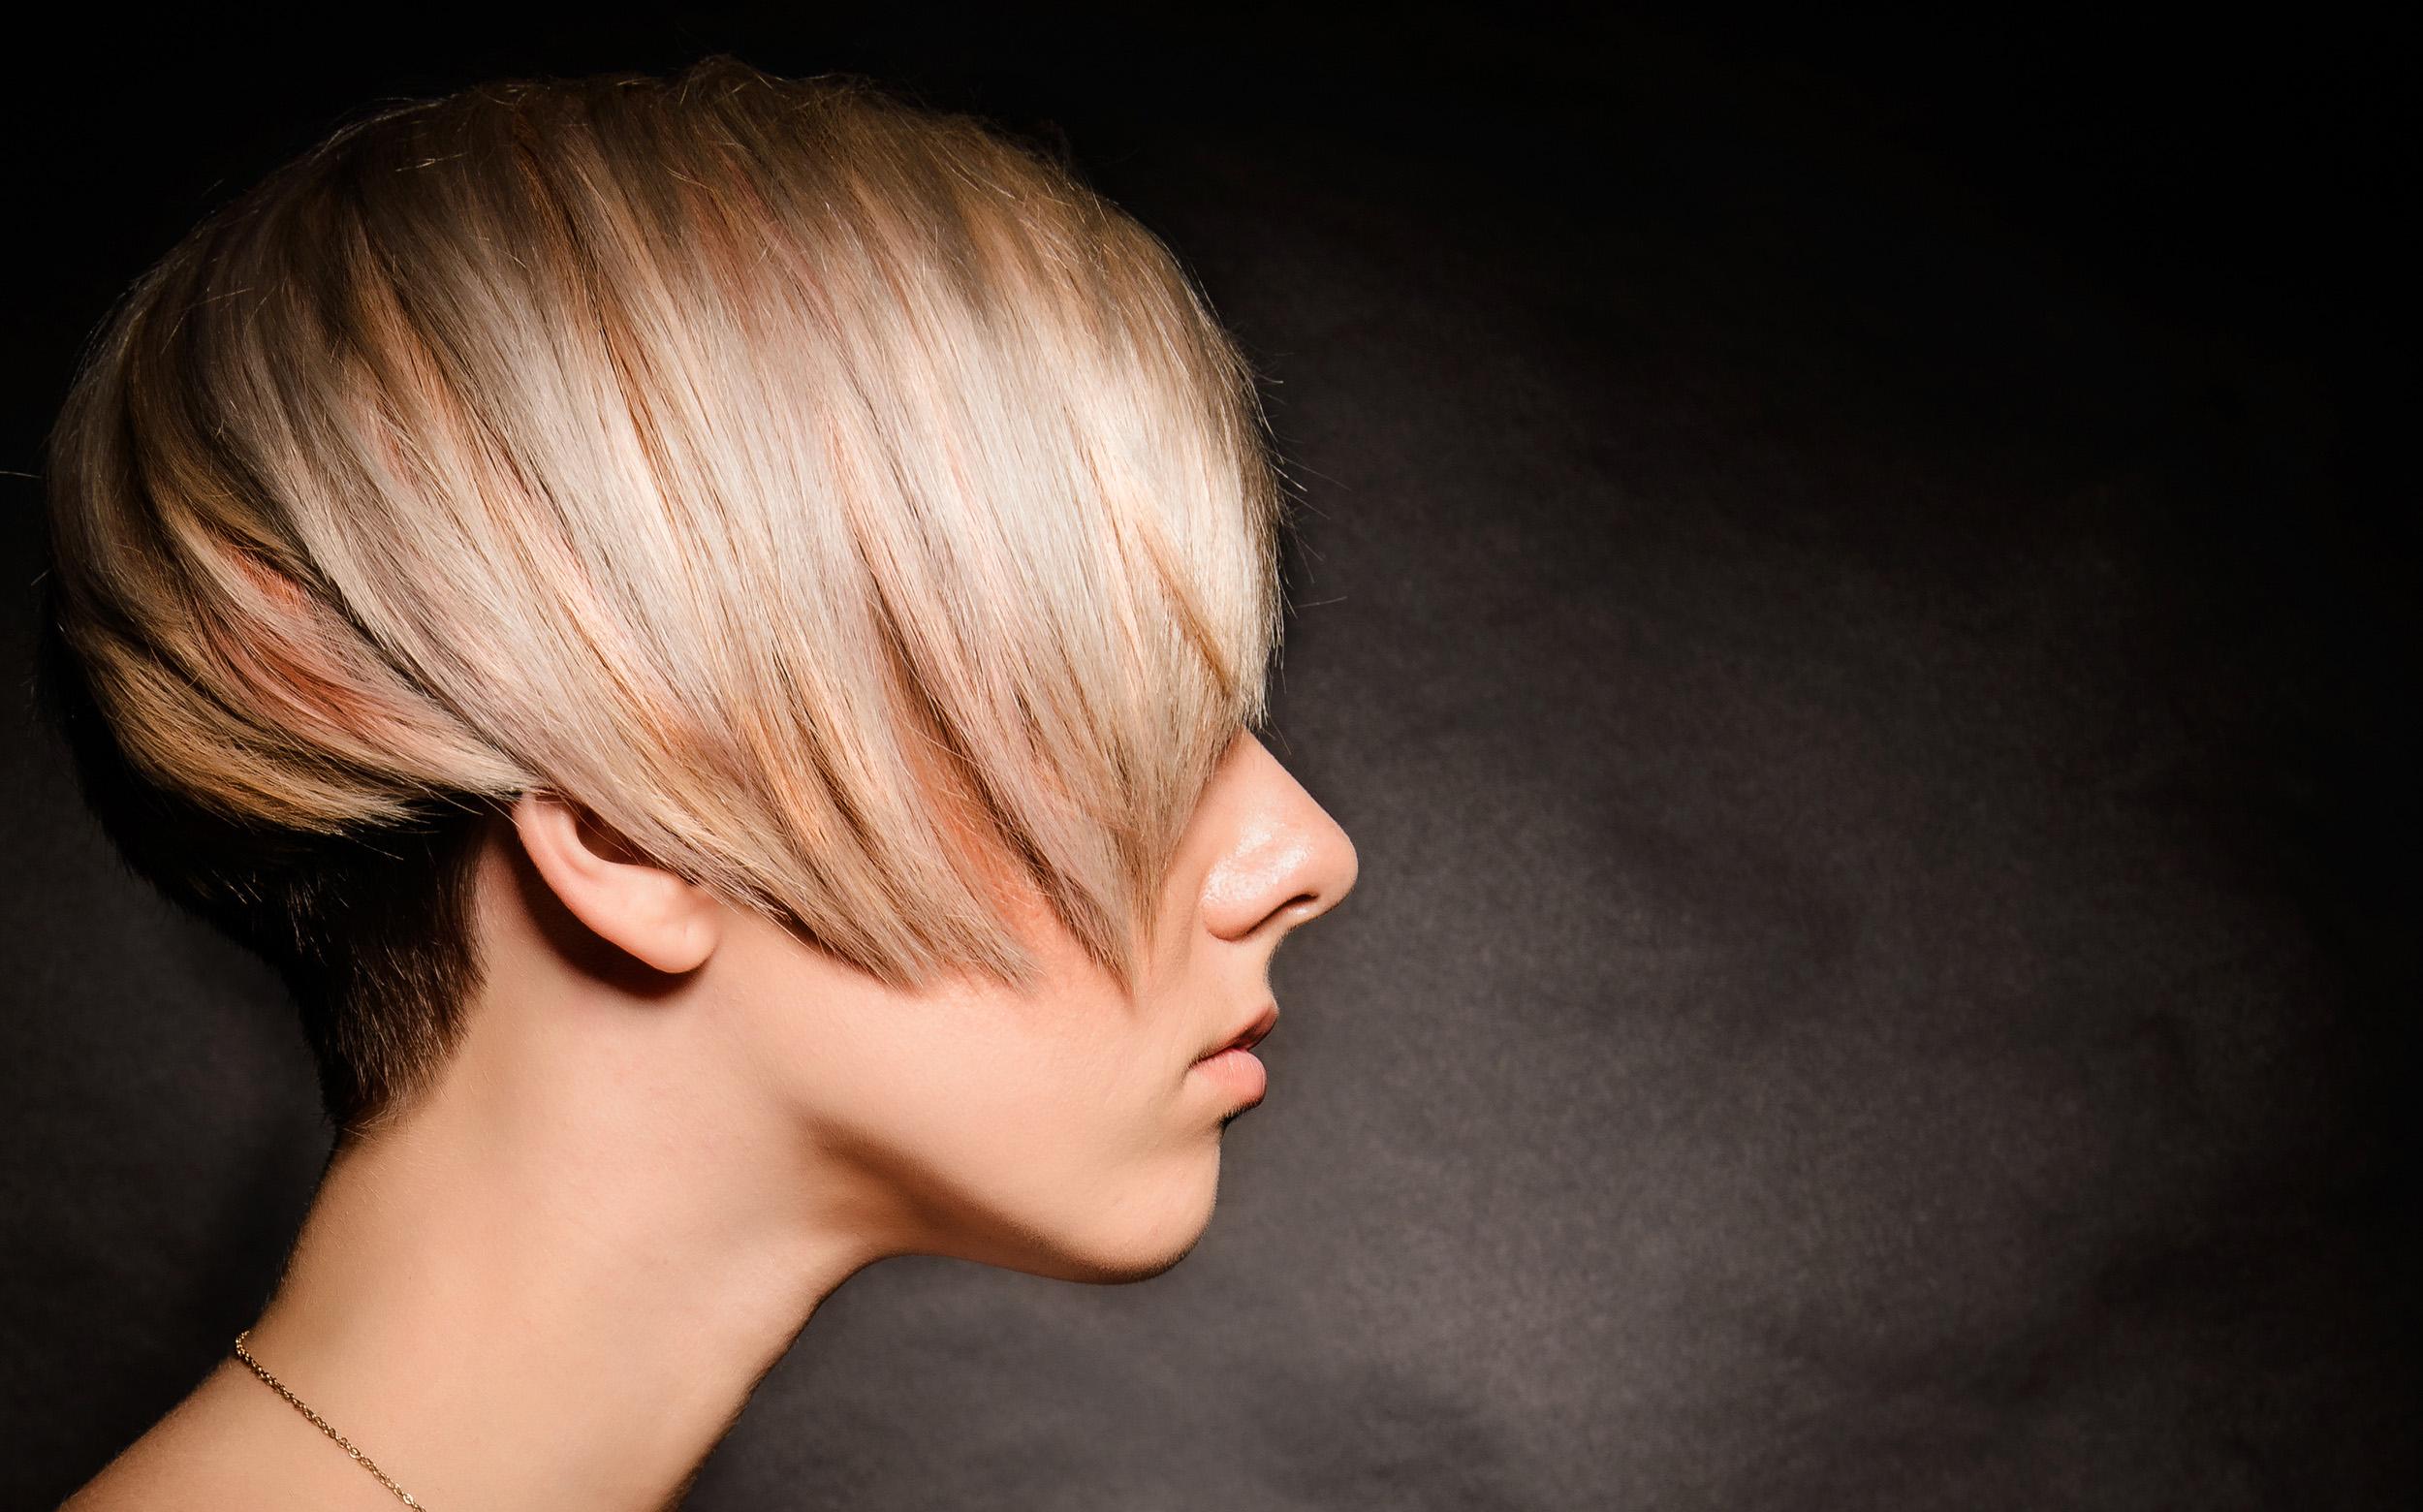 taglio-corto-zephir-parrucchieri-ascona.jpg